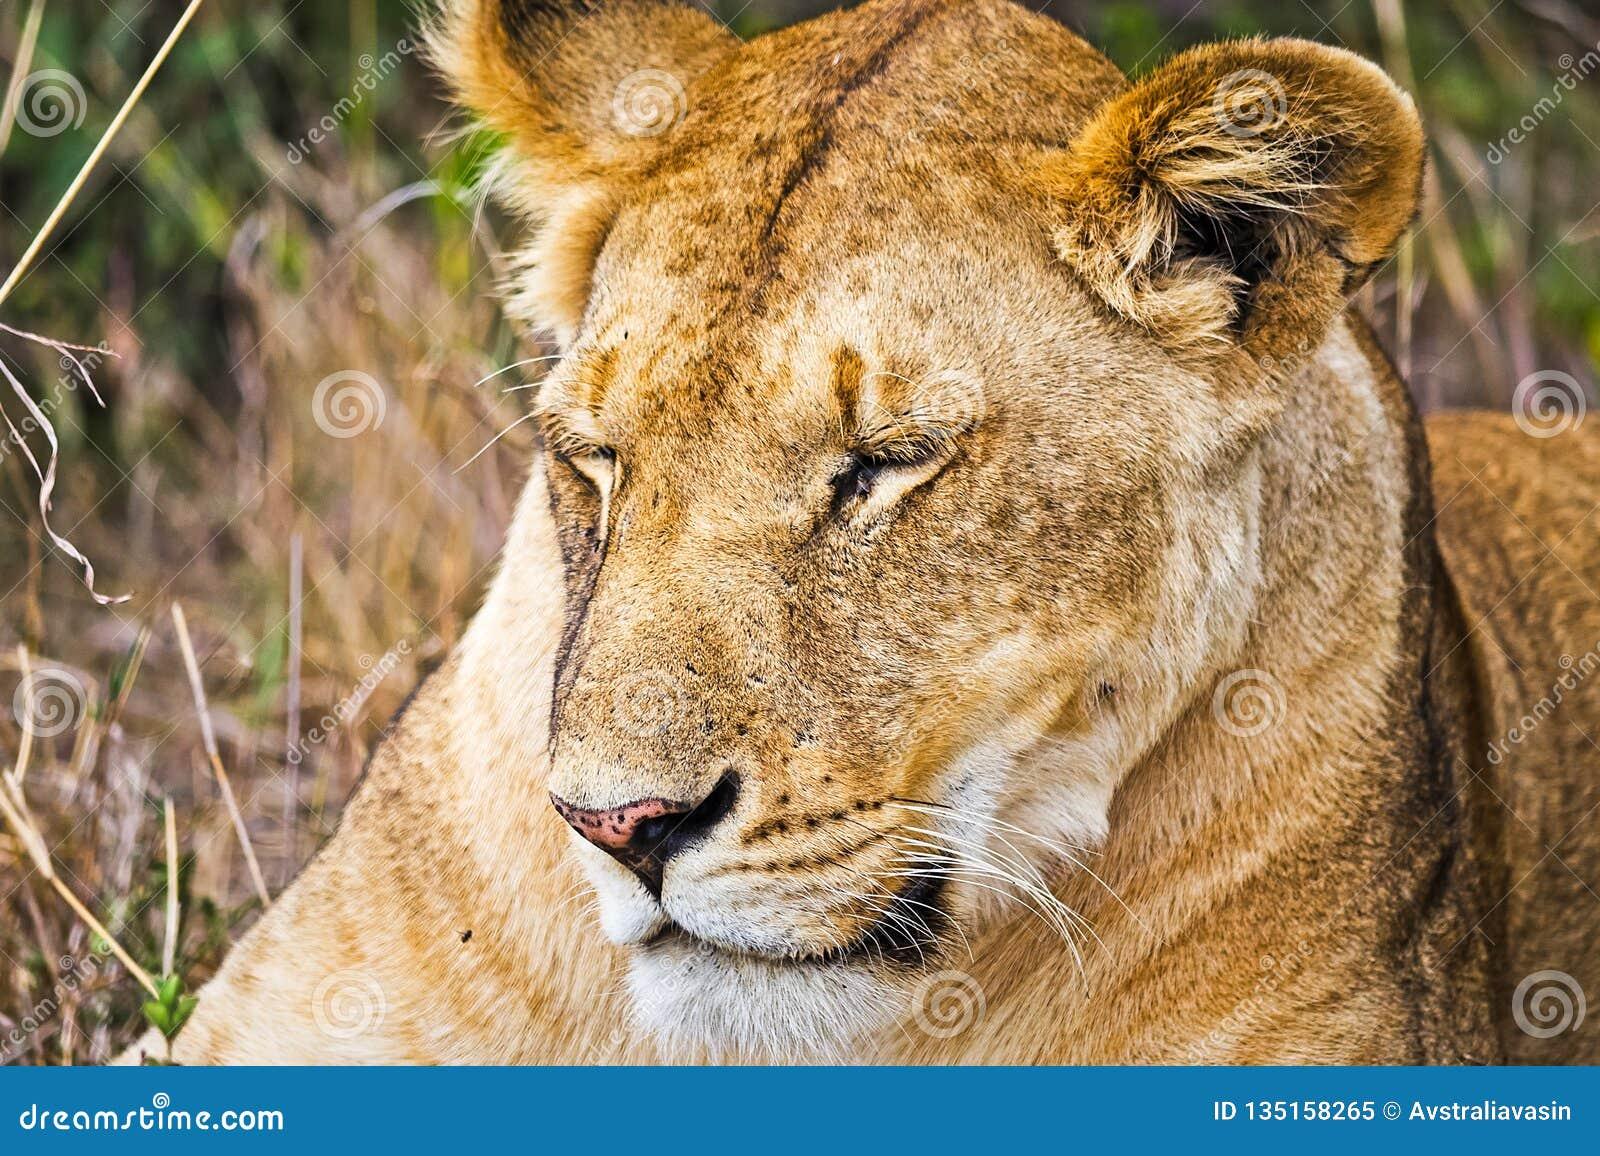 Lion in the wild in the African. Lion - predator felines